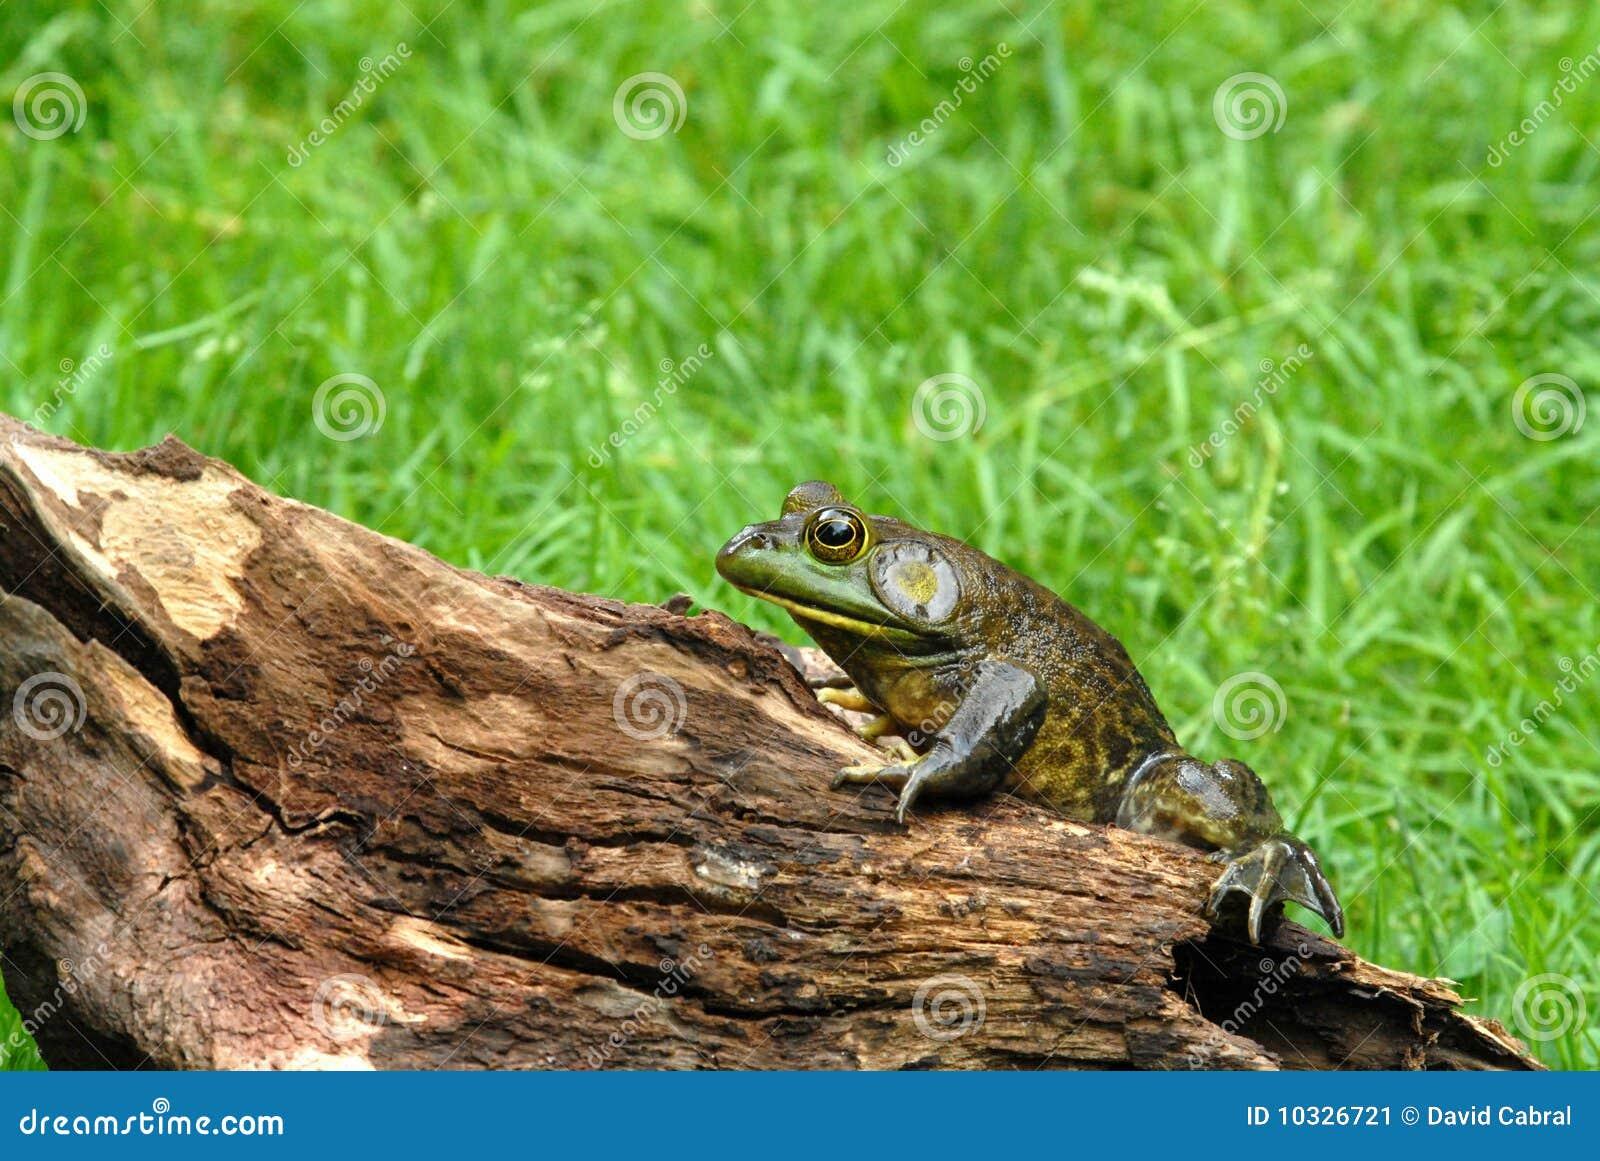 America bullfrog on log